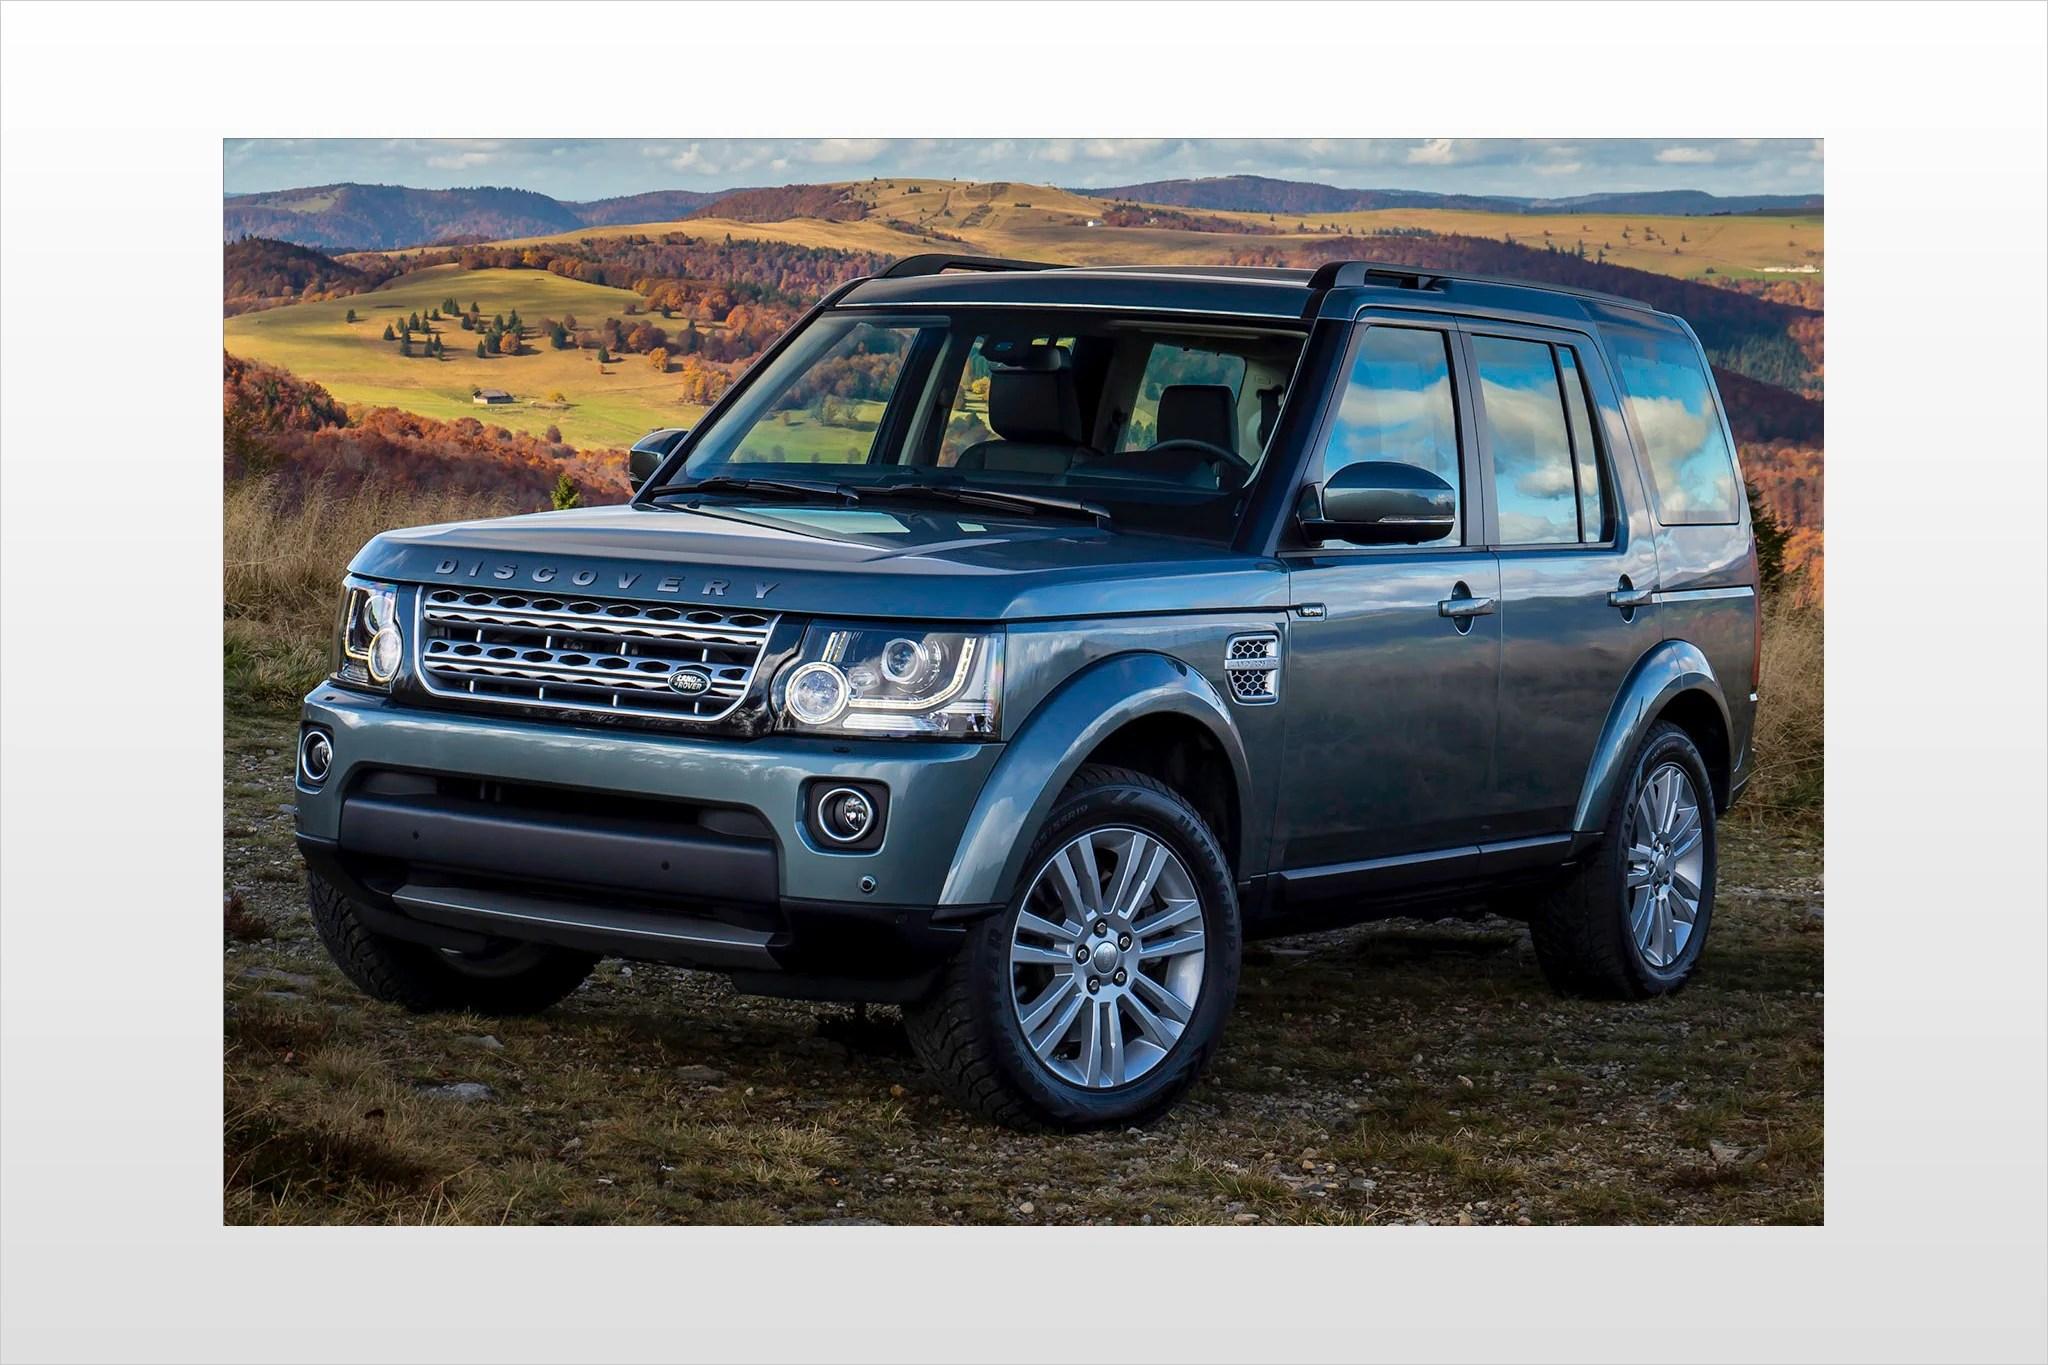 Maintenance Schedule for 2015 Land Rover LR4